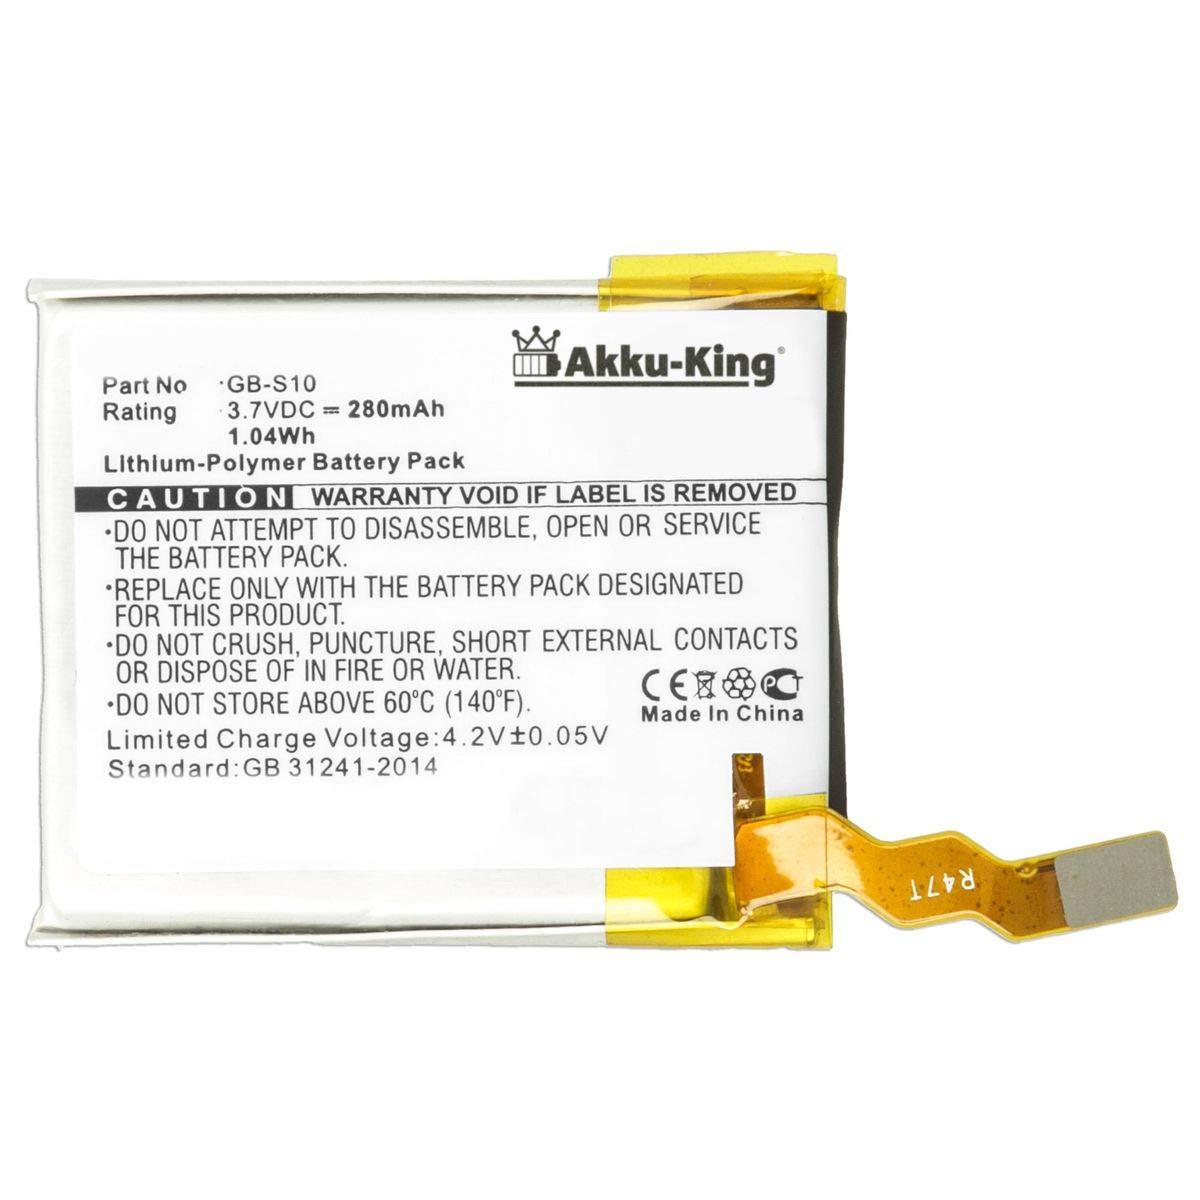 Akku-King - Batería para Sony GB-S10, GB-S10-353235-0100 ...